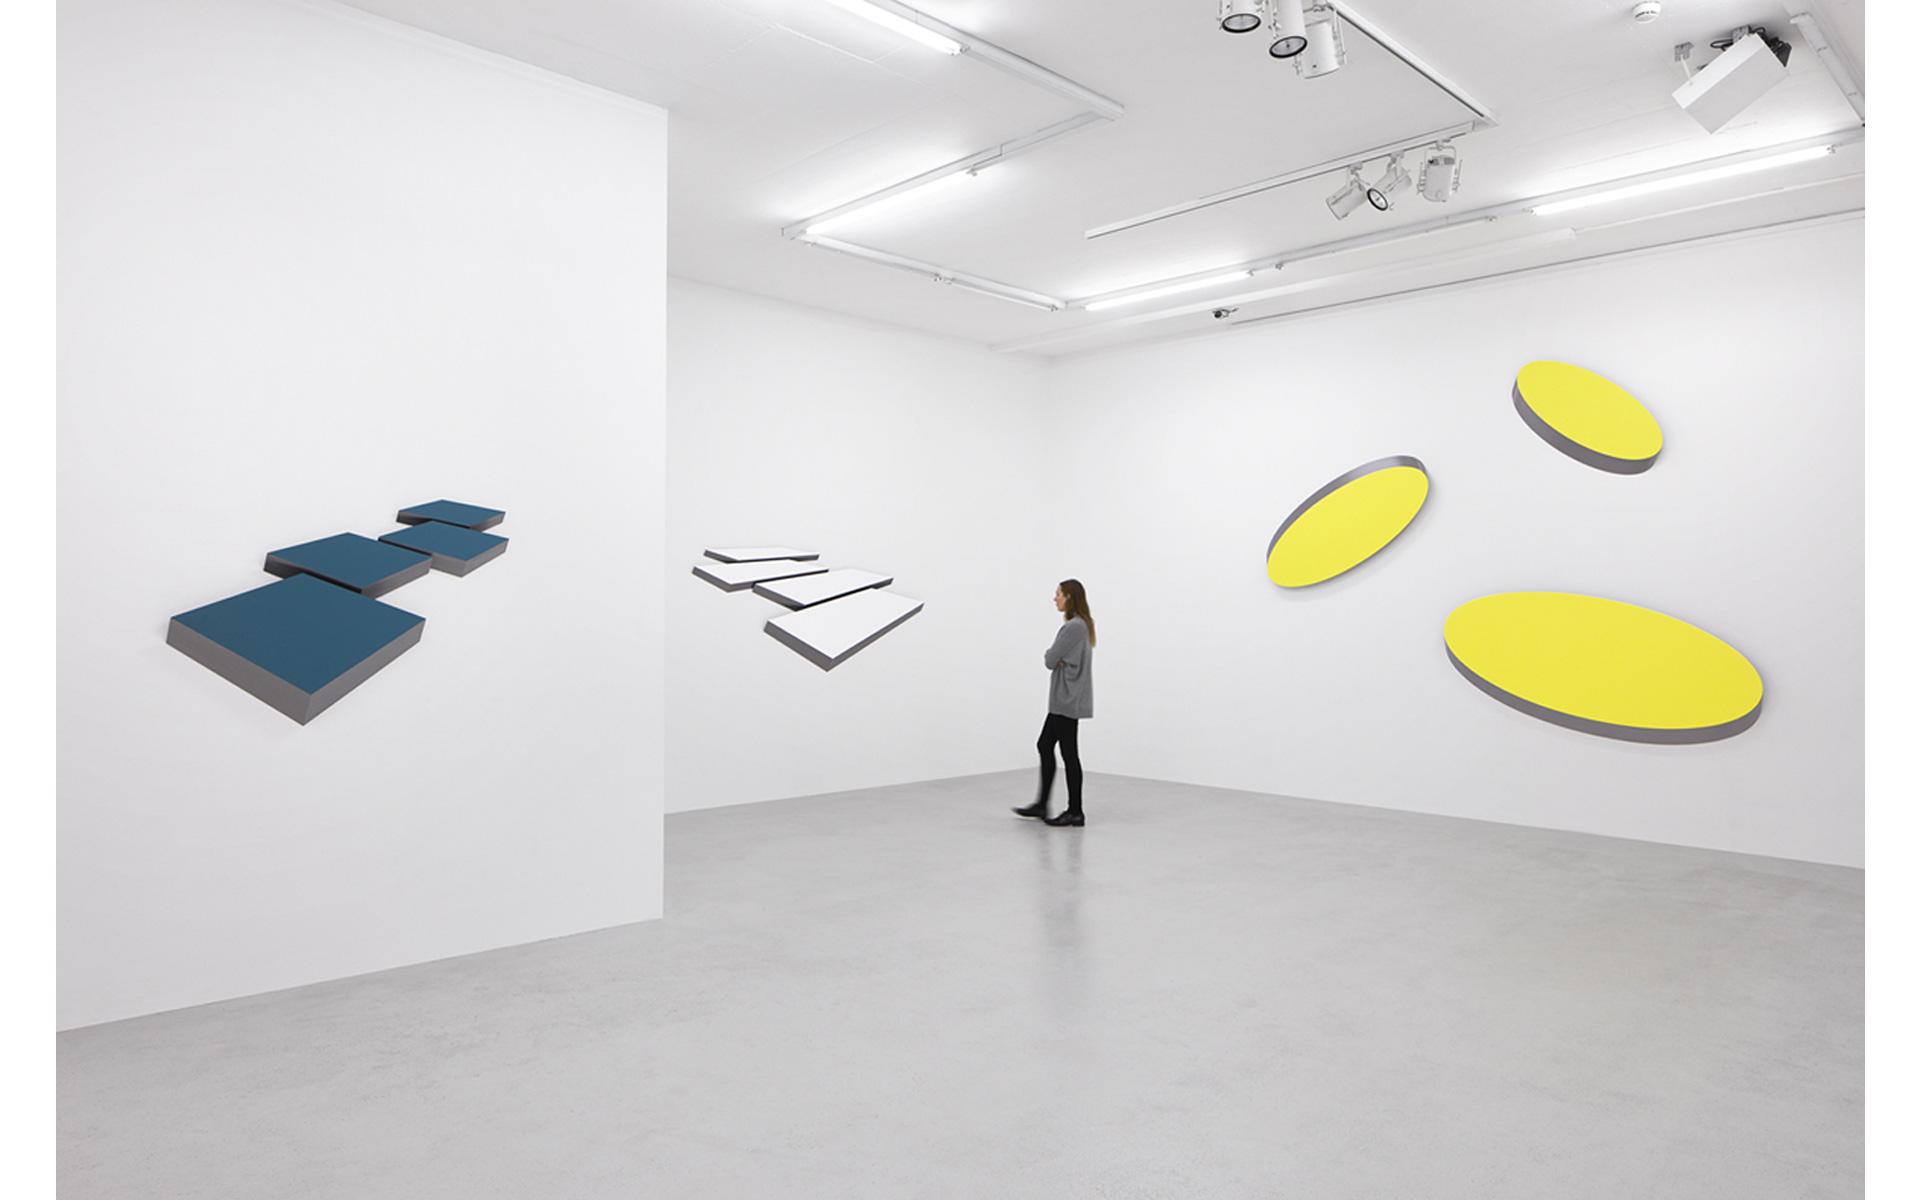 Installation view Gallery Lange + Pult, Zürich, 2018 - Photo: Sully Balmassière